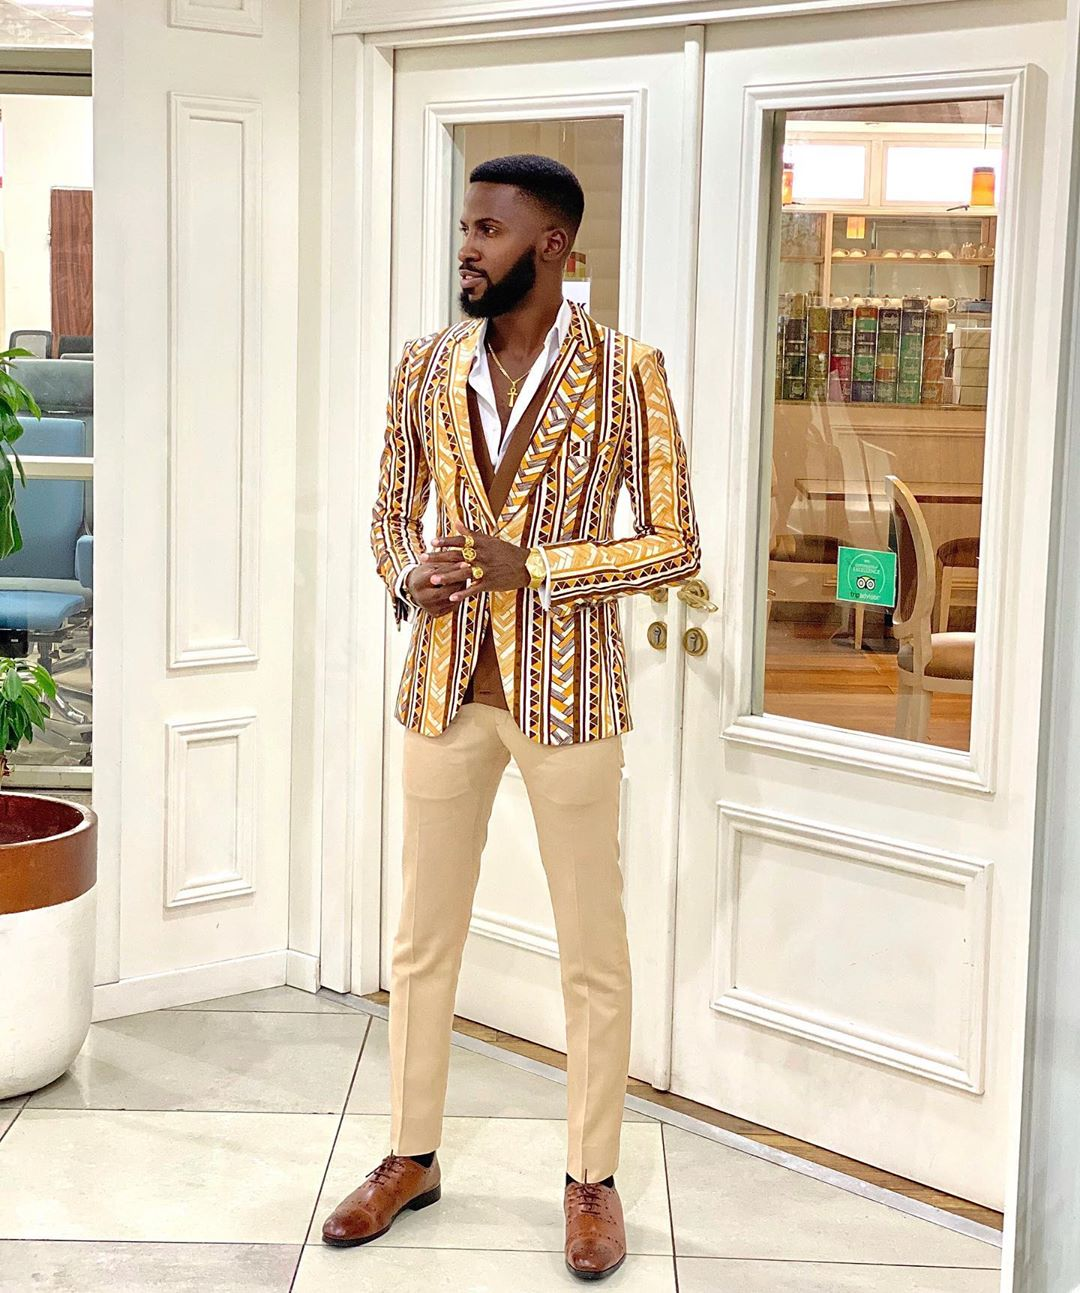 akin famine menswear fashion influencer Lagos Africa 2020